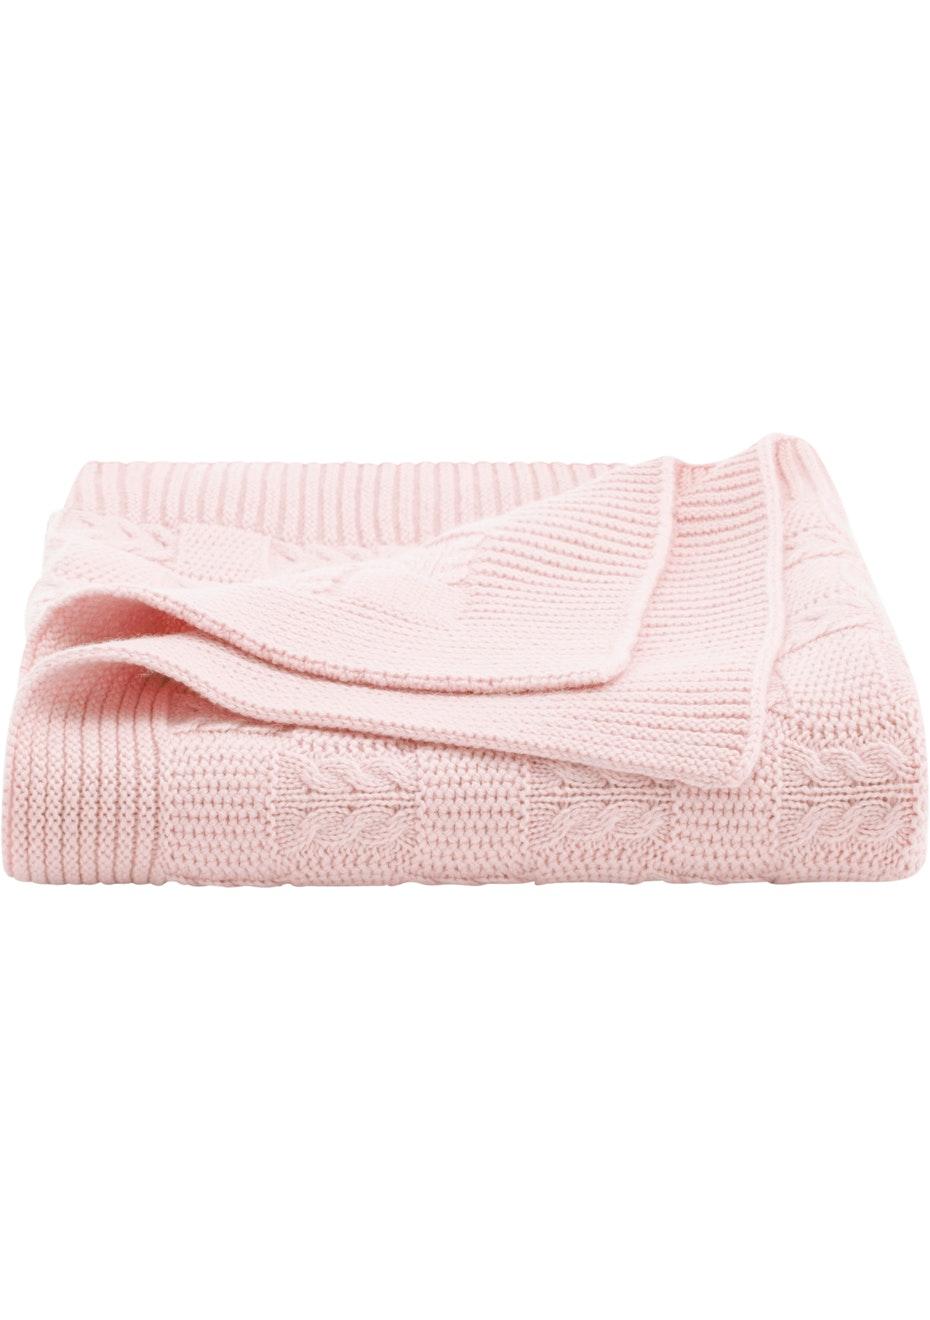 Sheridan - Callaghan - Wool Blend Pram Blanket 75cm x 100cm - Pink